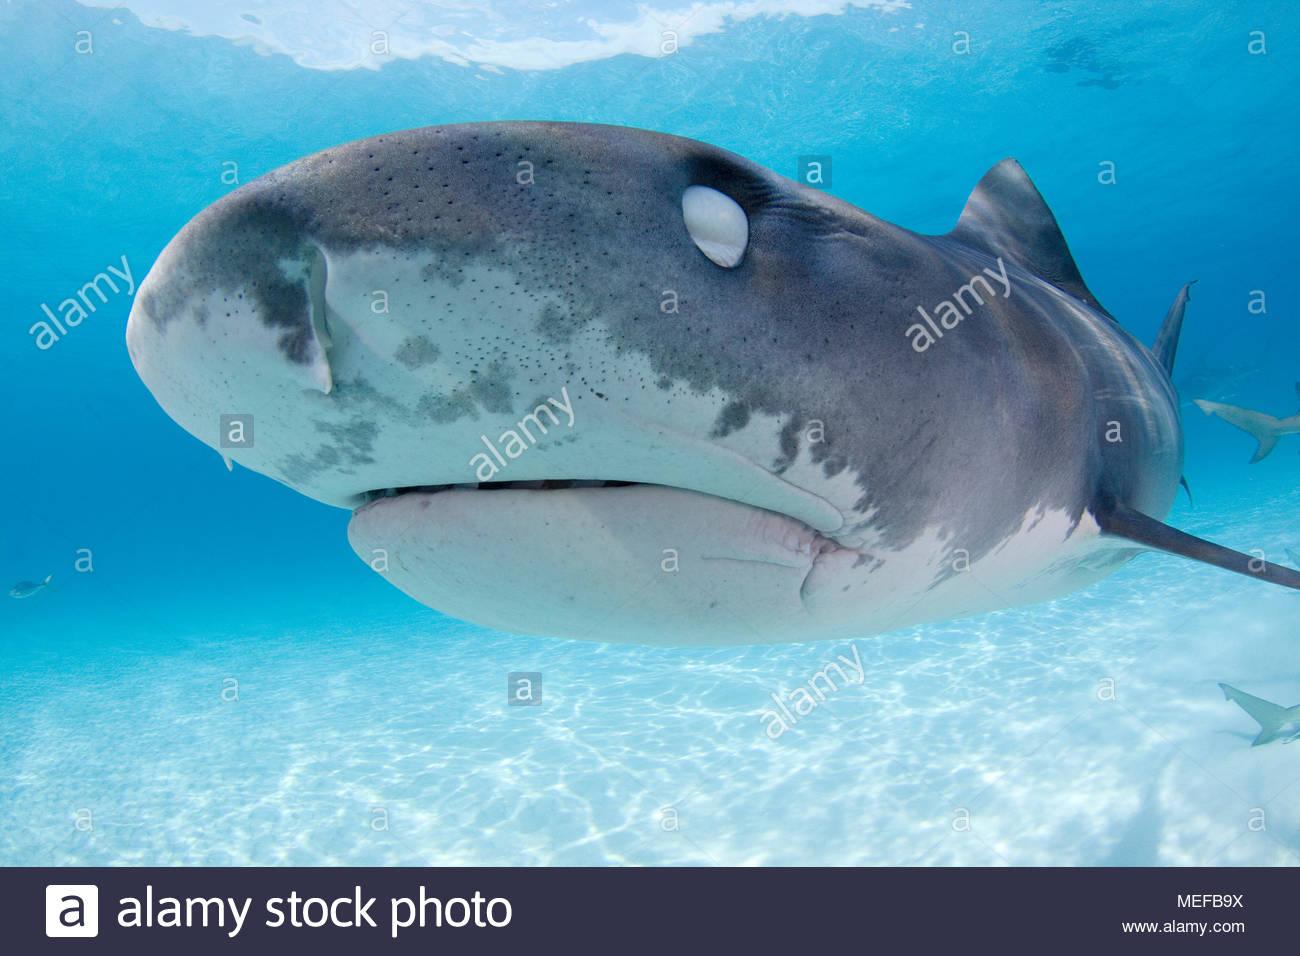 Tiger shark (Galeocerdo cuvier) with closed nictitating membrane for protecting eyes, Bahama Banks, Bahamas - Stock Image